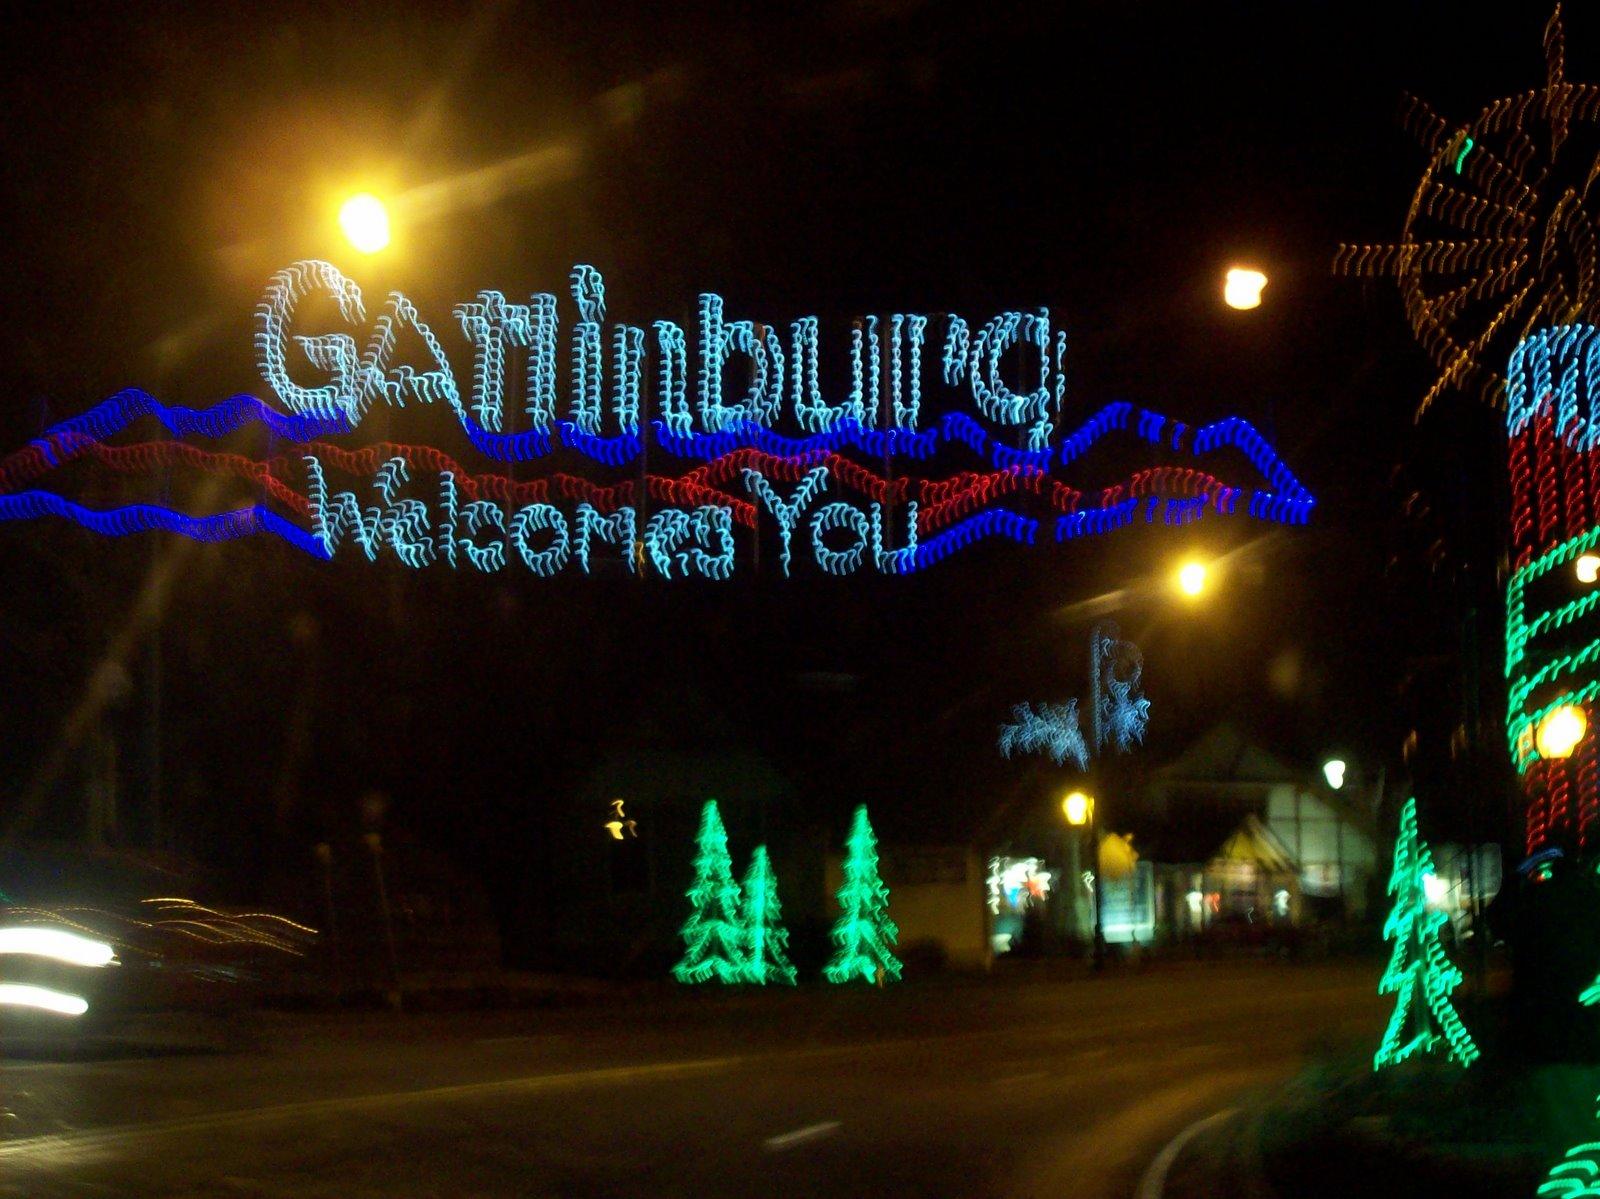 Canada Goose' discounts in gatlinburg